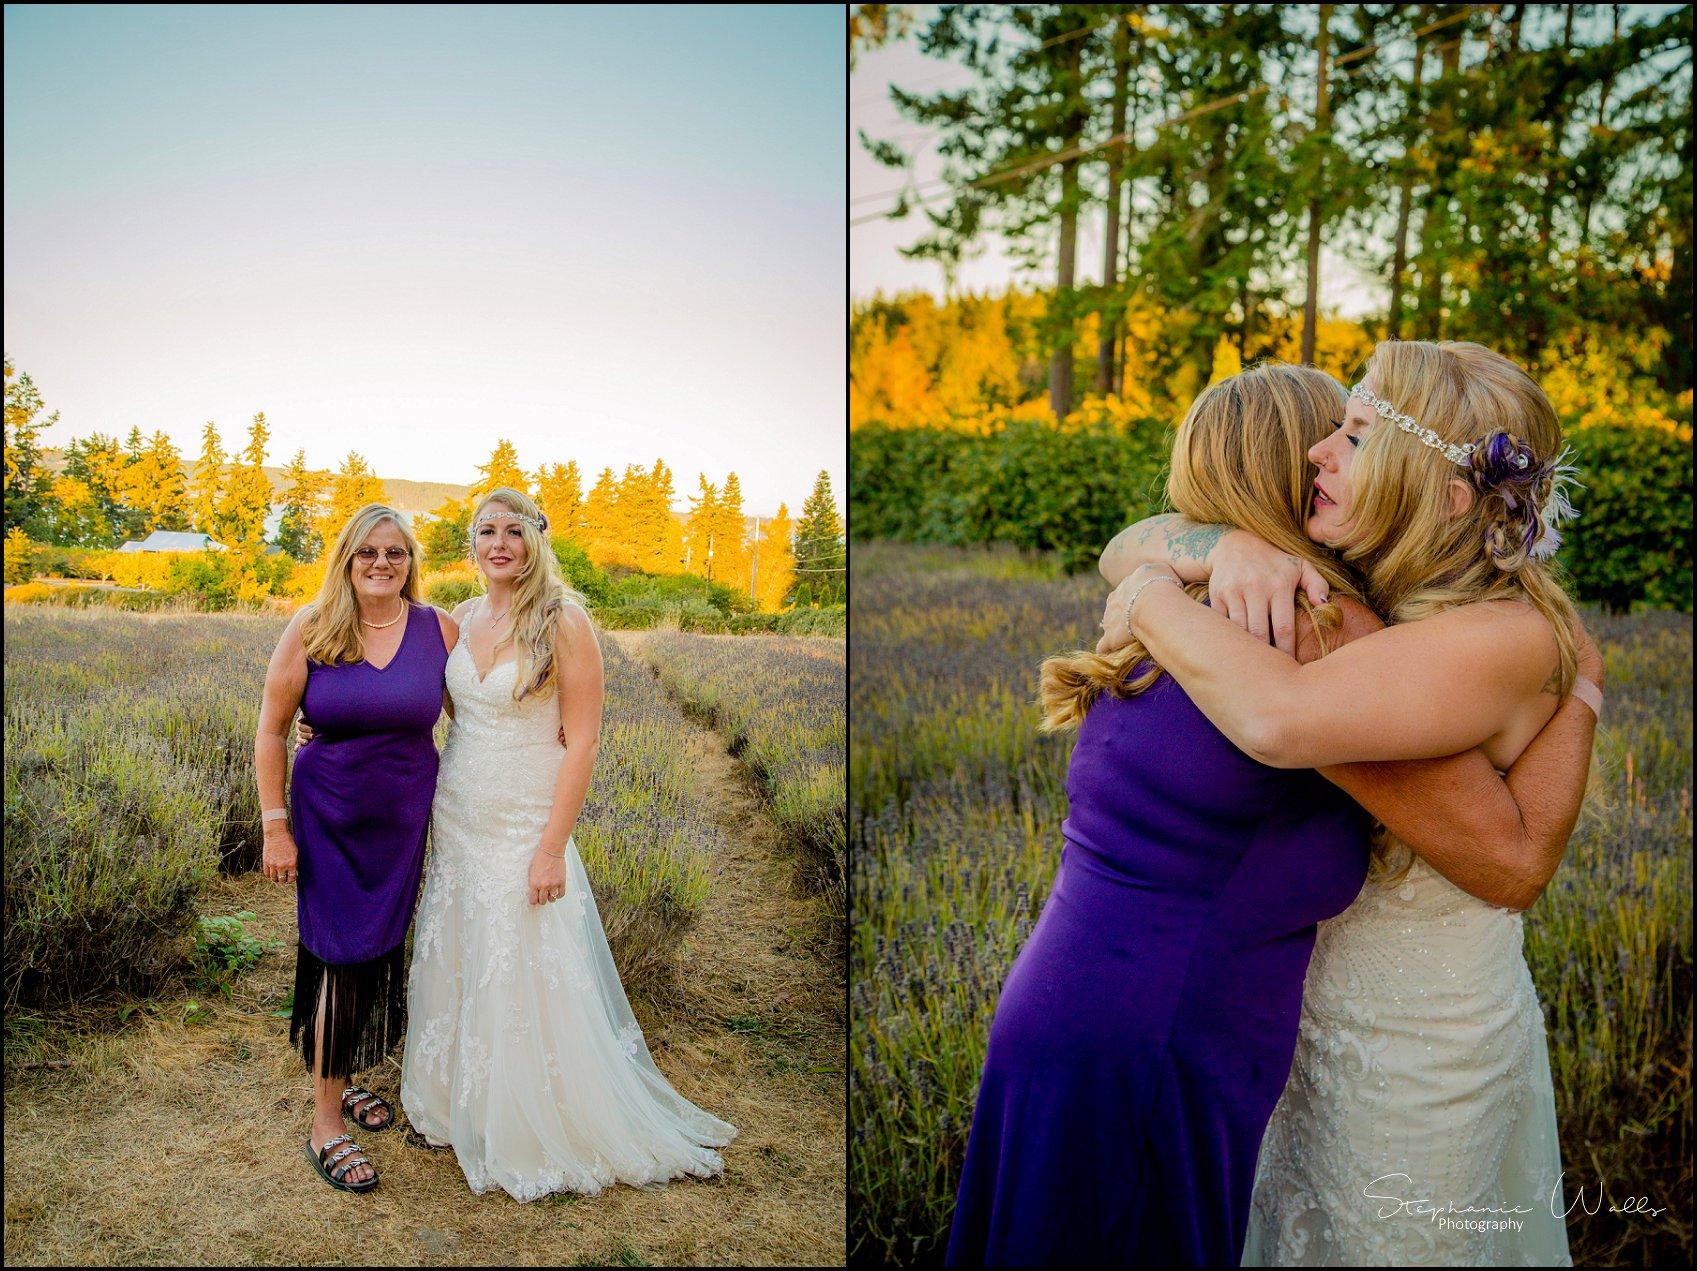 Everist Wedding 081 1 Patti & Bobbys | Troll Haven Castle & Bandy Farms | Sequim, Wa Wedding Photographer